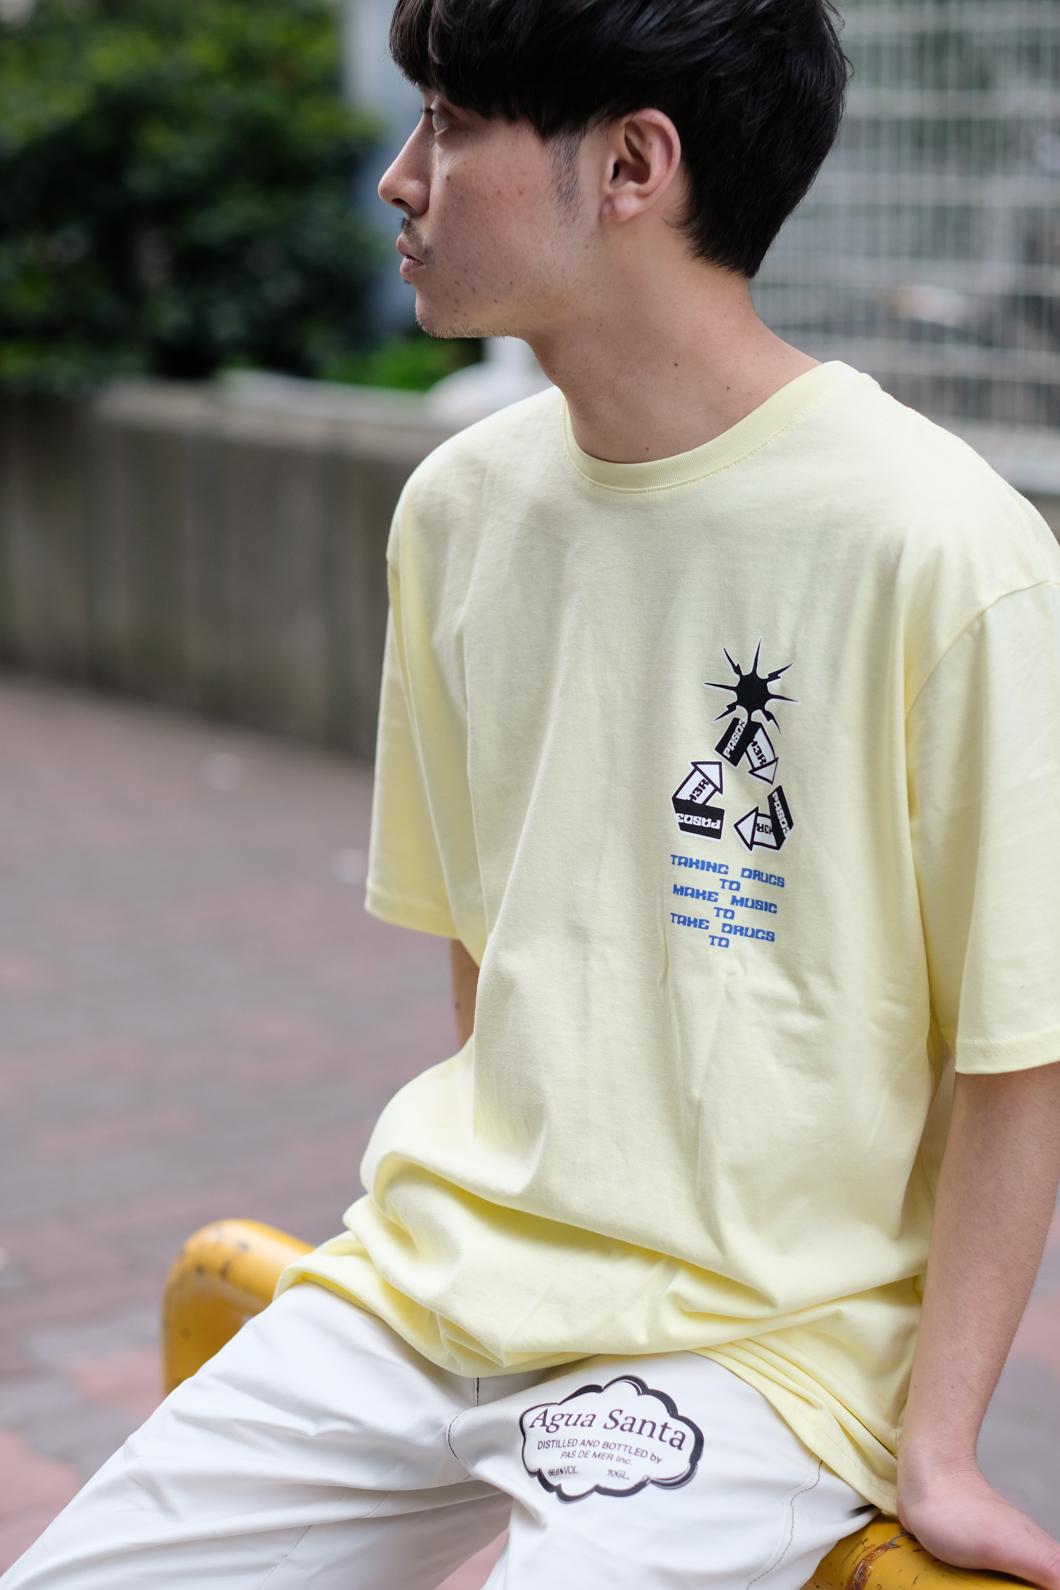 【PAS DE MER/パドゥメ】SPACEMAN3 T-SHIRT Tシャツ / YELLOW